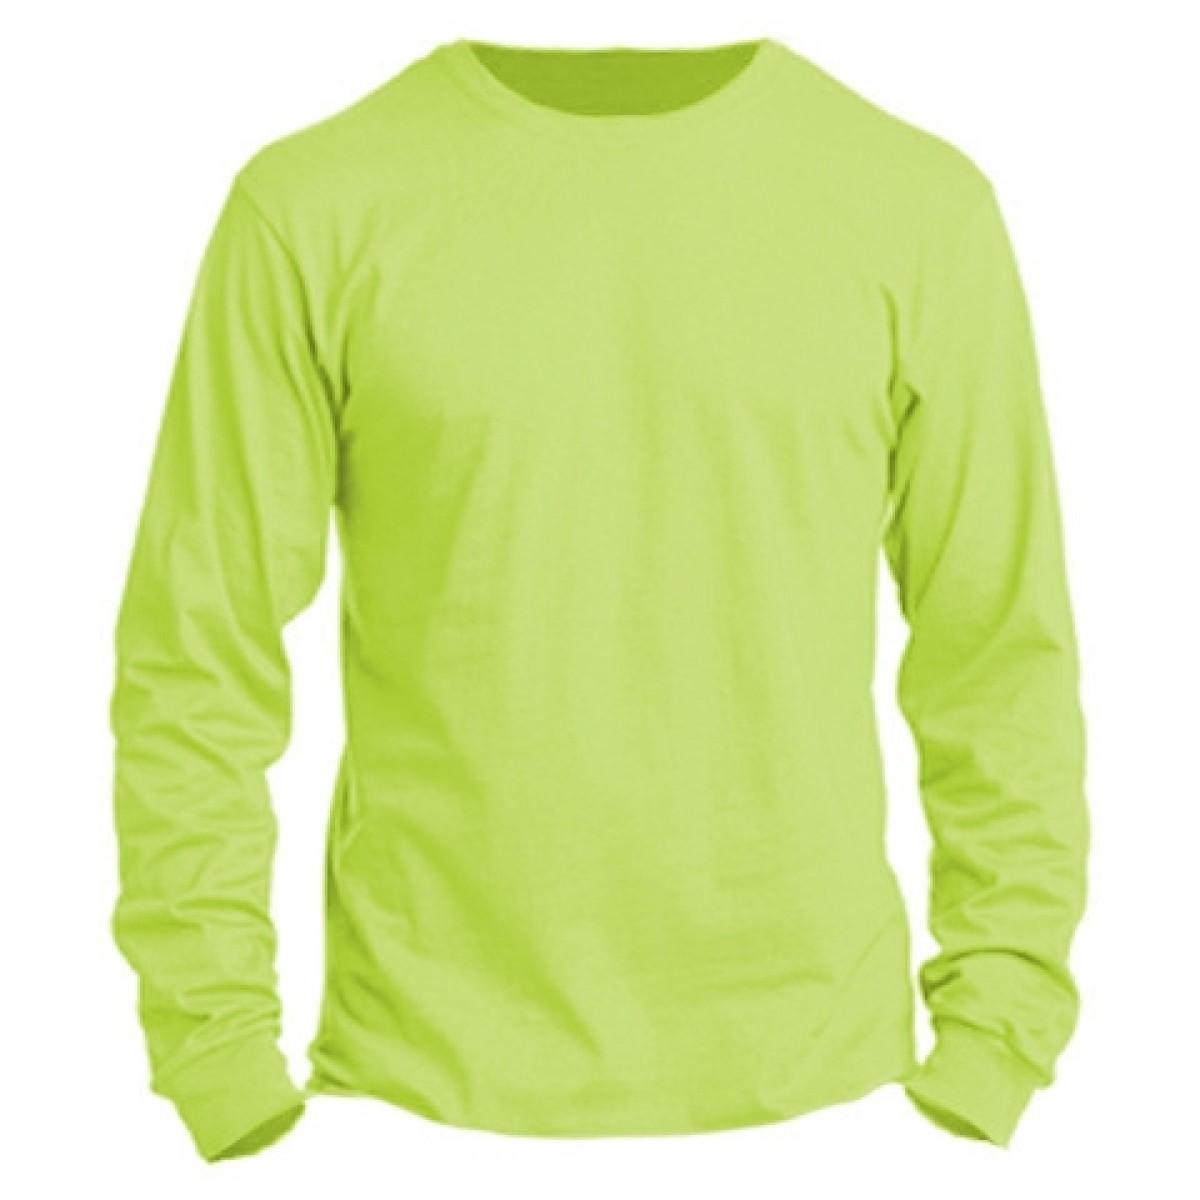 Basic Long Sleeve Crew Neck -Neon Green-XL